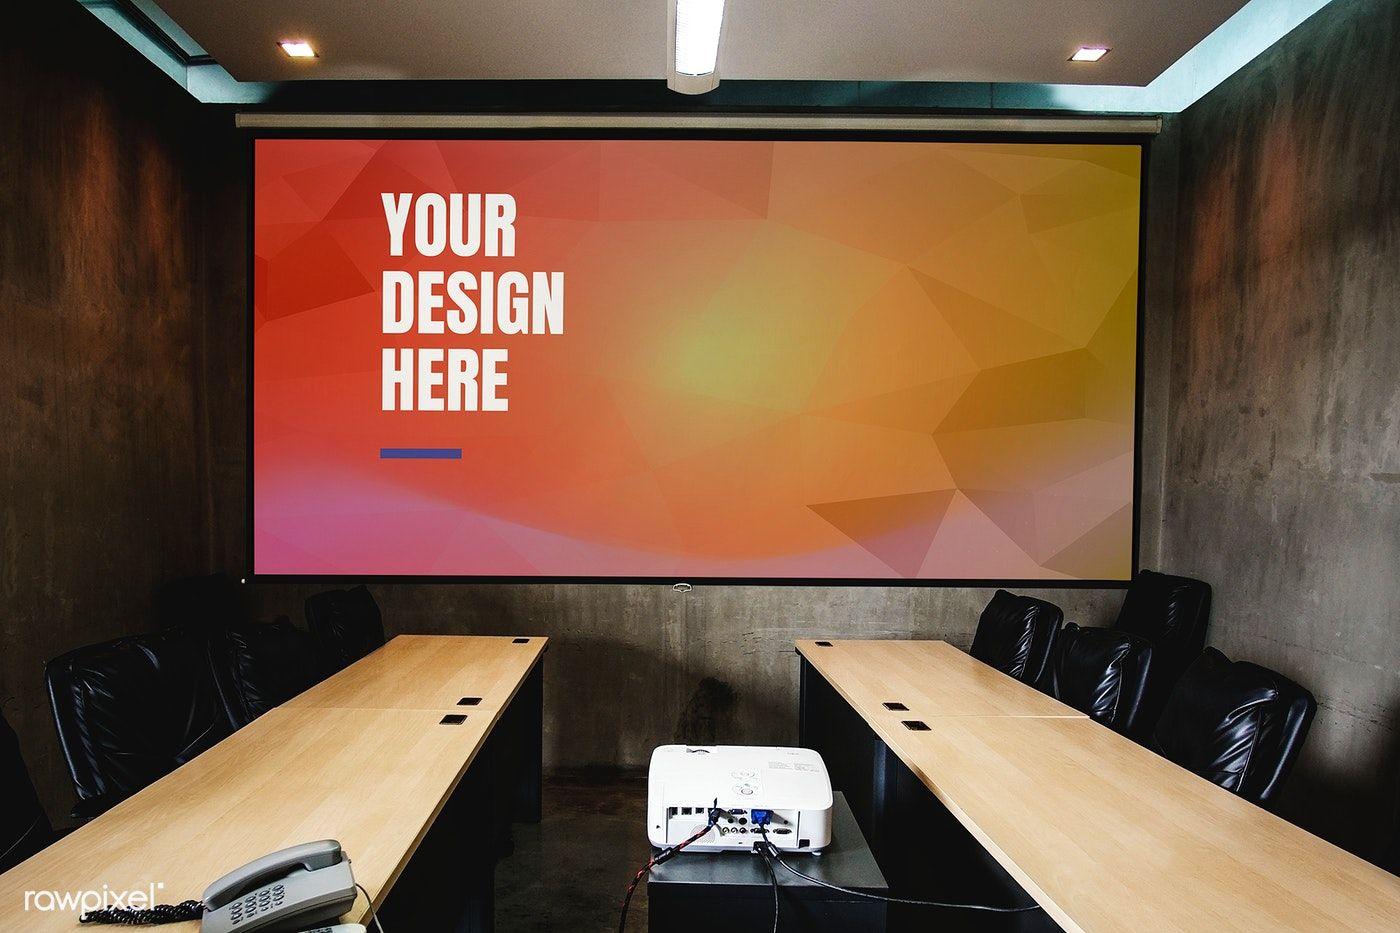 Download Premium Psd Of Projector Screen Mockup In A Meeting Room 894864 Mockup Meeting Room Projector Screen